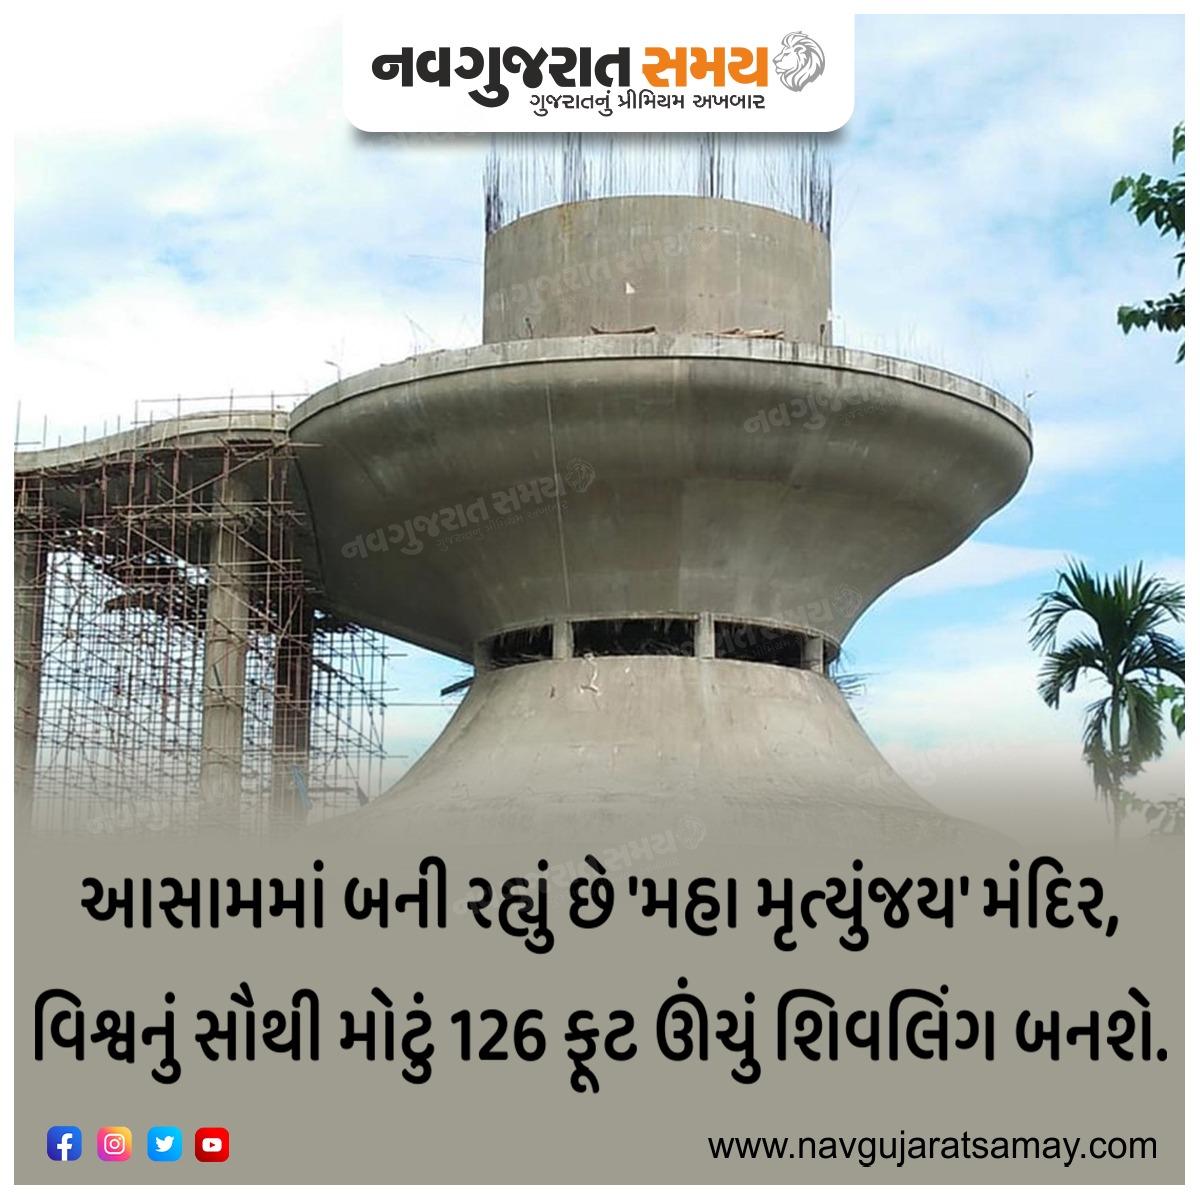 Assam is making world's biggest Maha Mrutryunjay Temple which has a 126 feet long Shiva Linga  #lord #shiva #assam #bholenath #worldrecord #india #tourism https://t.co/ZQp1JrNTYY